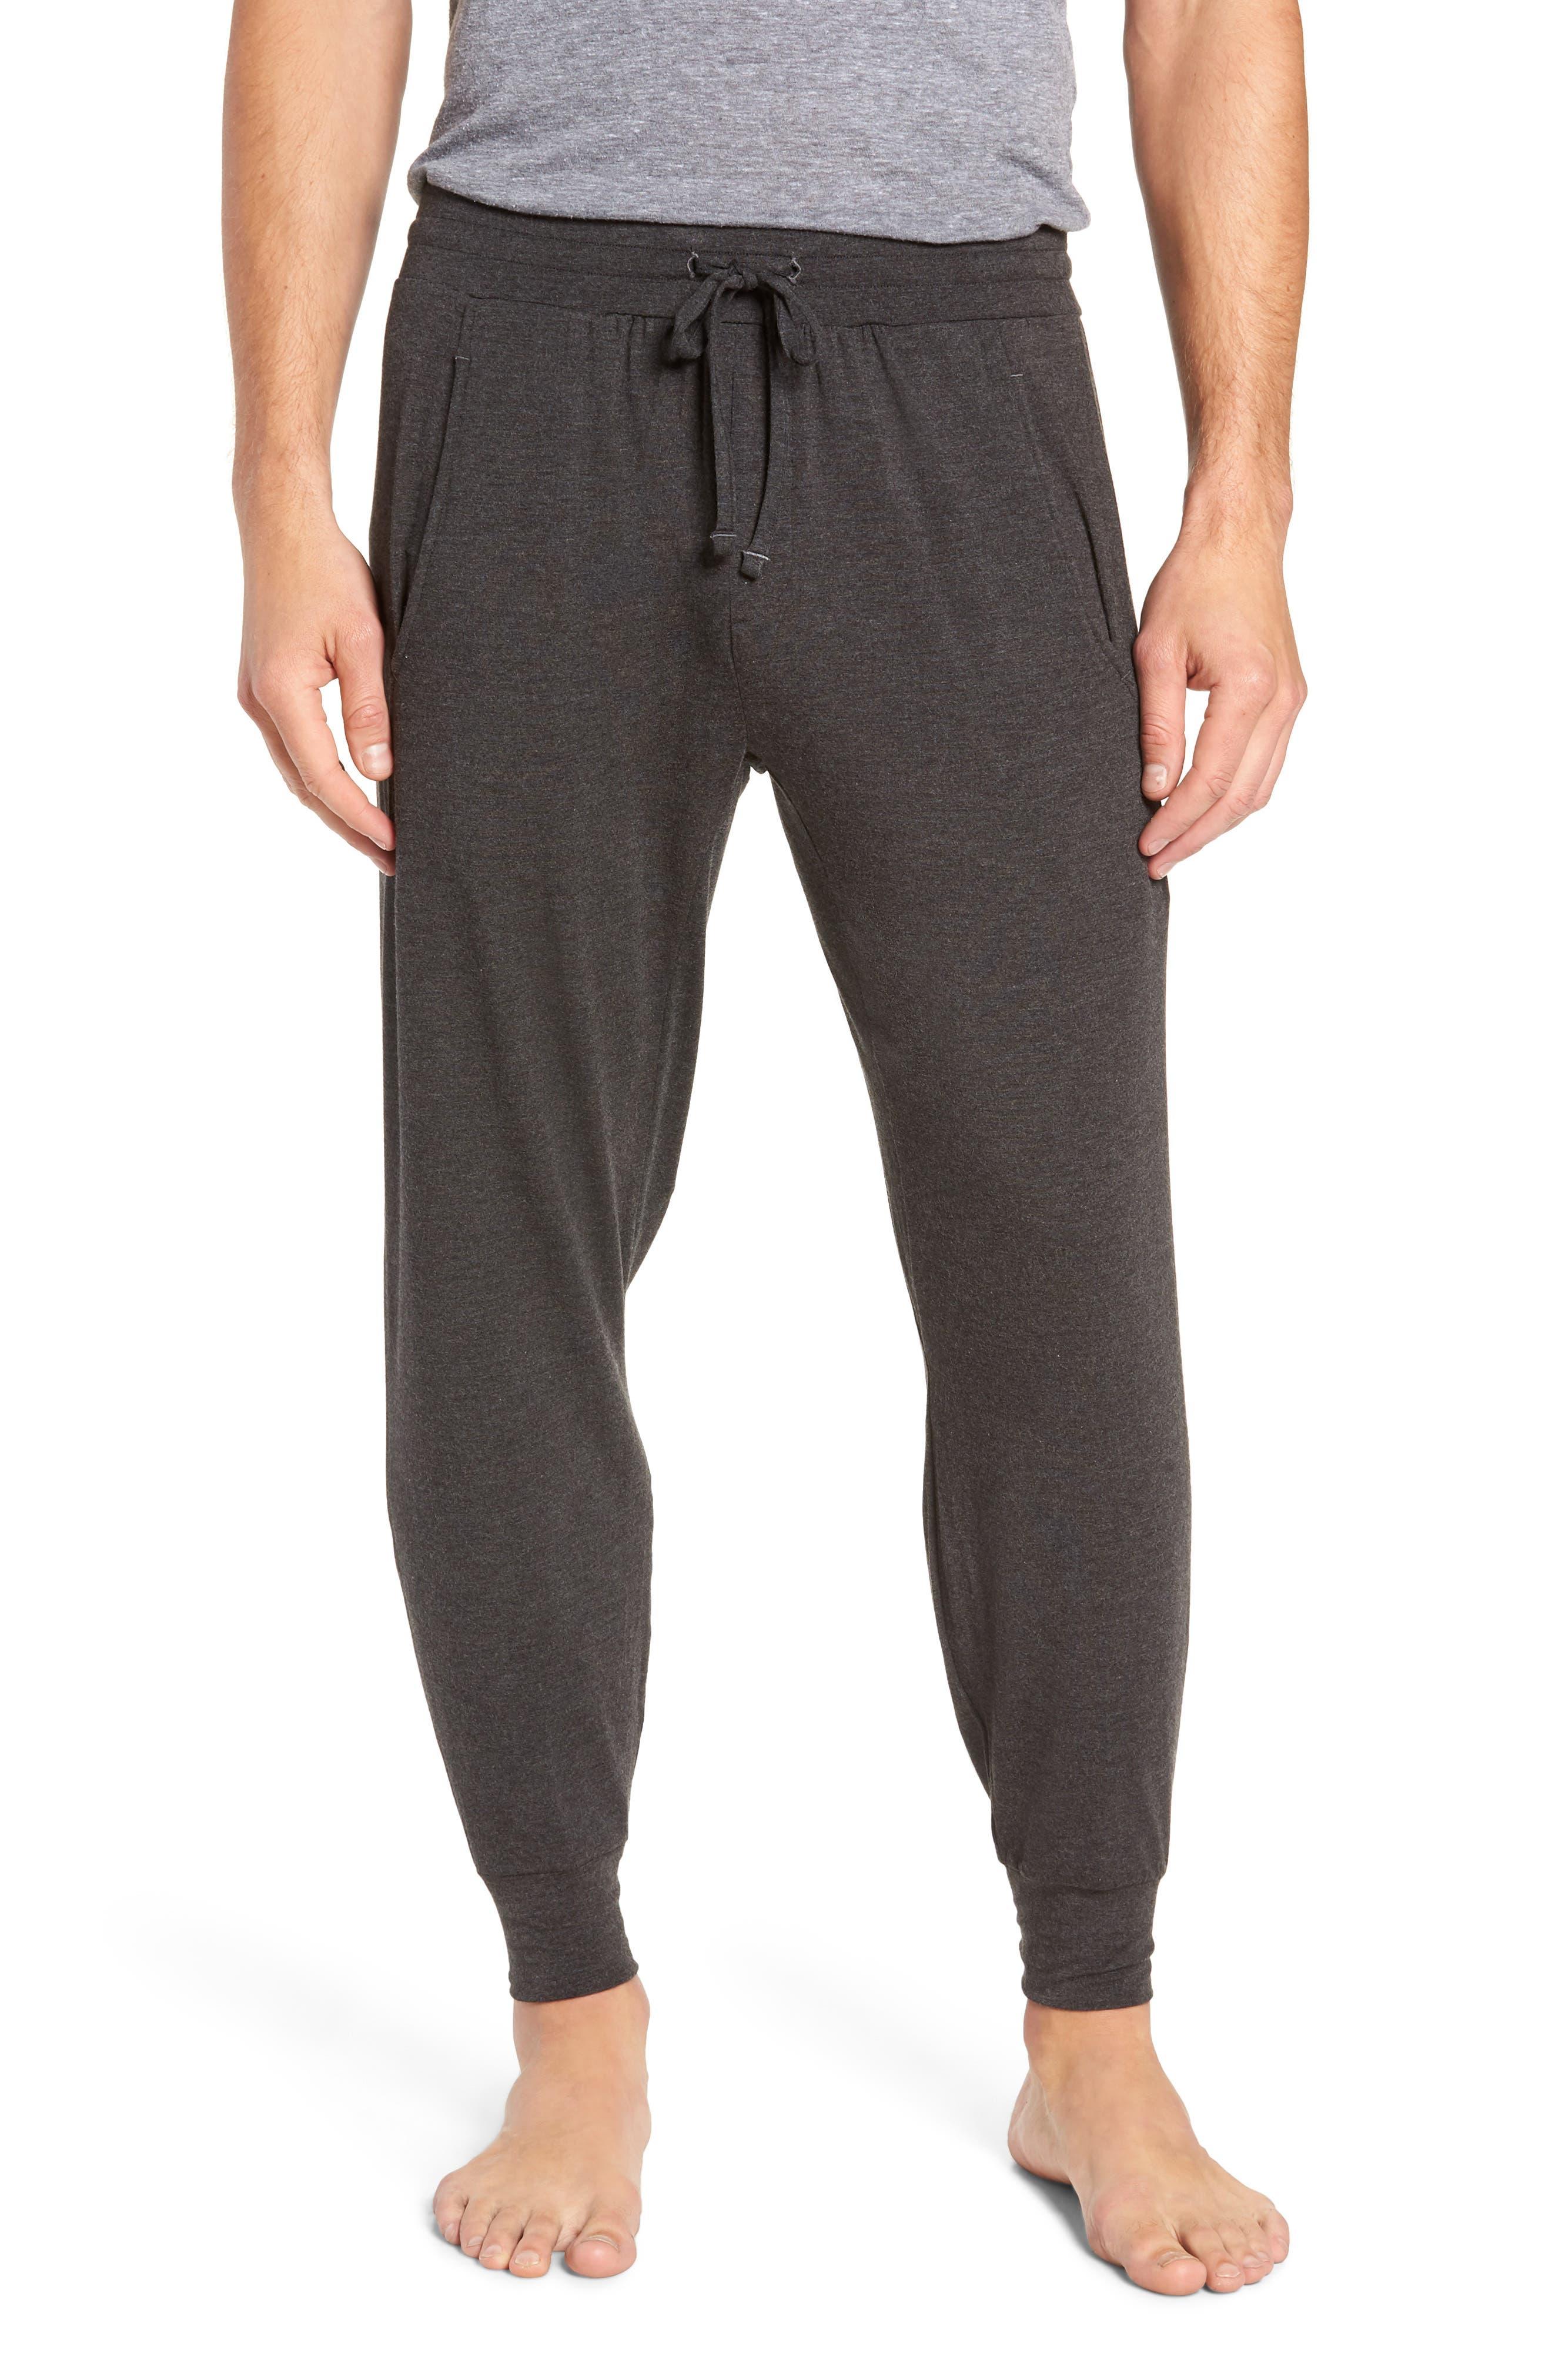 Jogger Pants,                         Main,                         color, CHARCOAL HEATHER